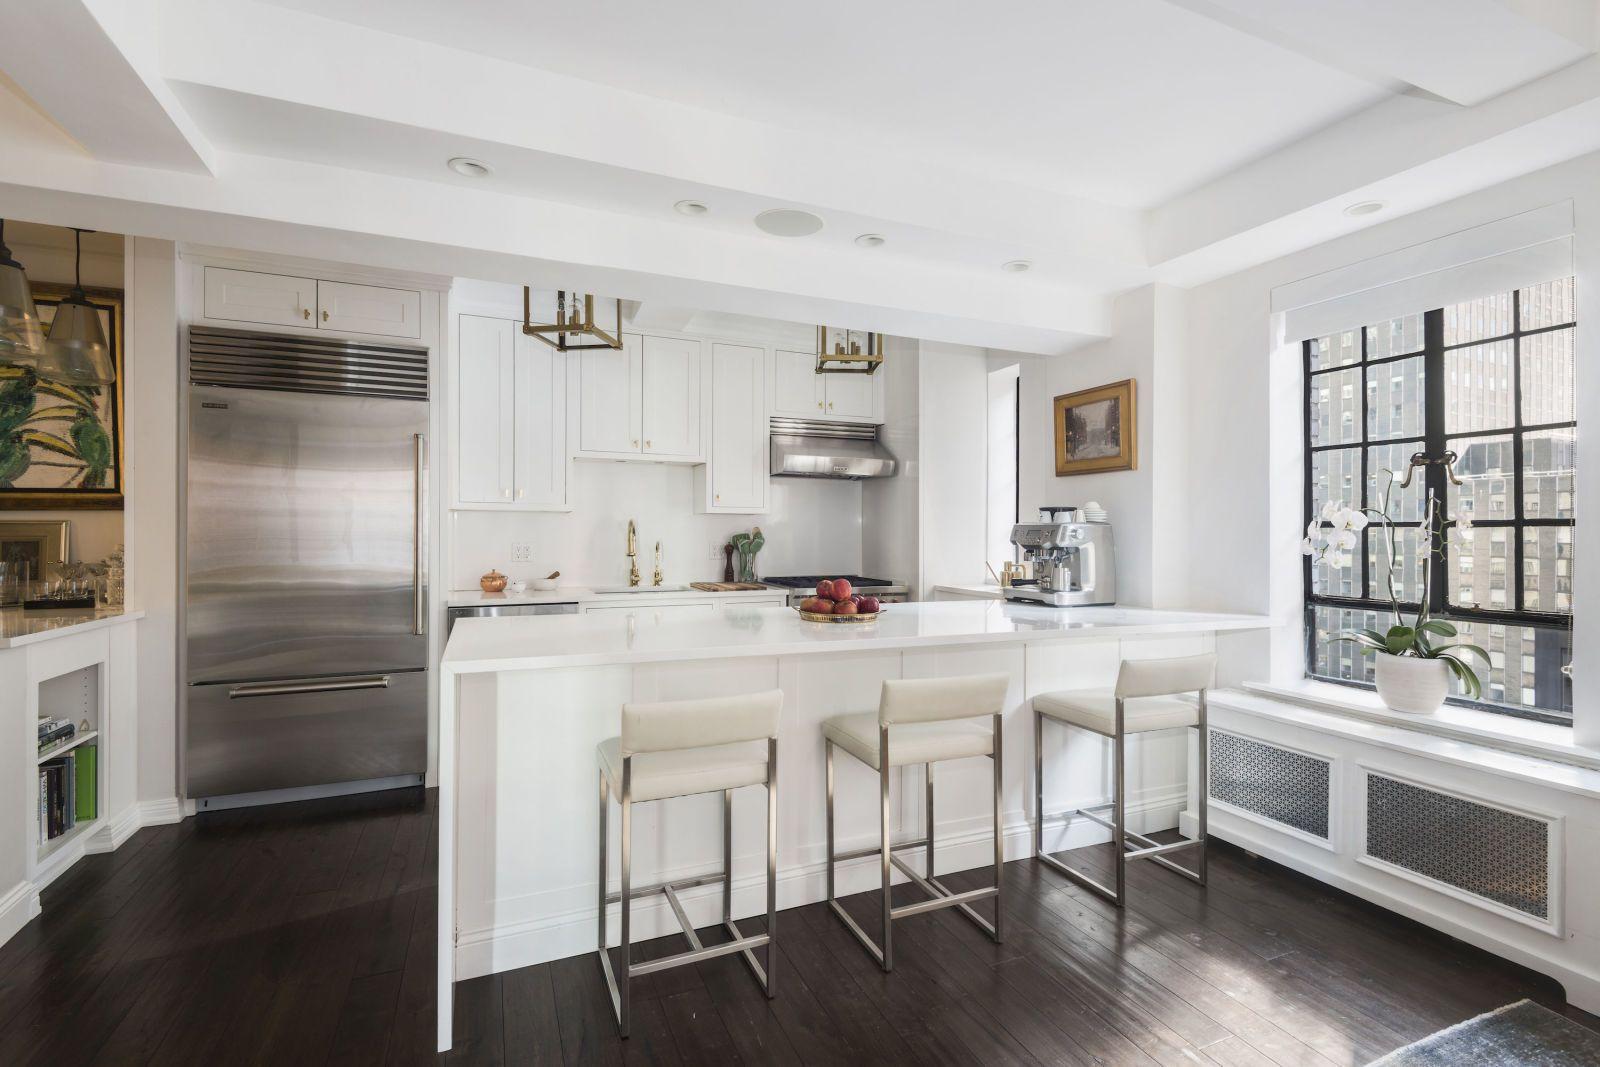 Daphne Oz Is Ing Her Manhattan Apartment For 2 5 Million